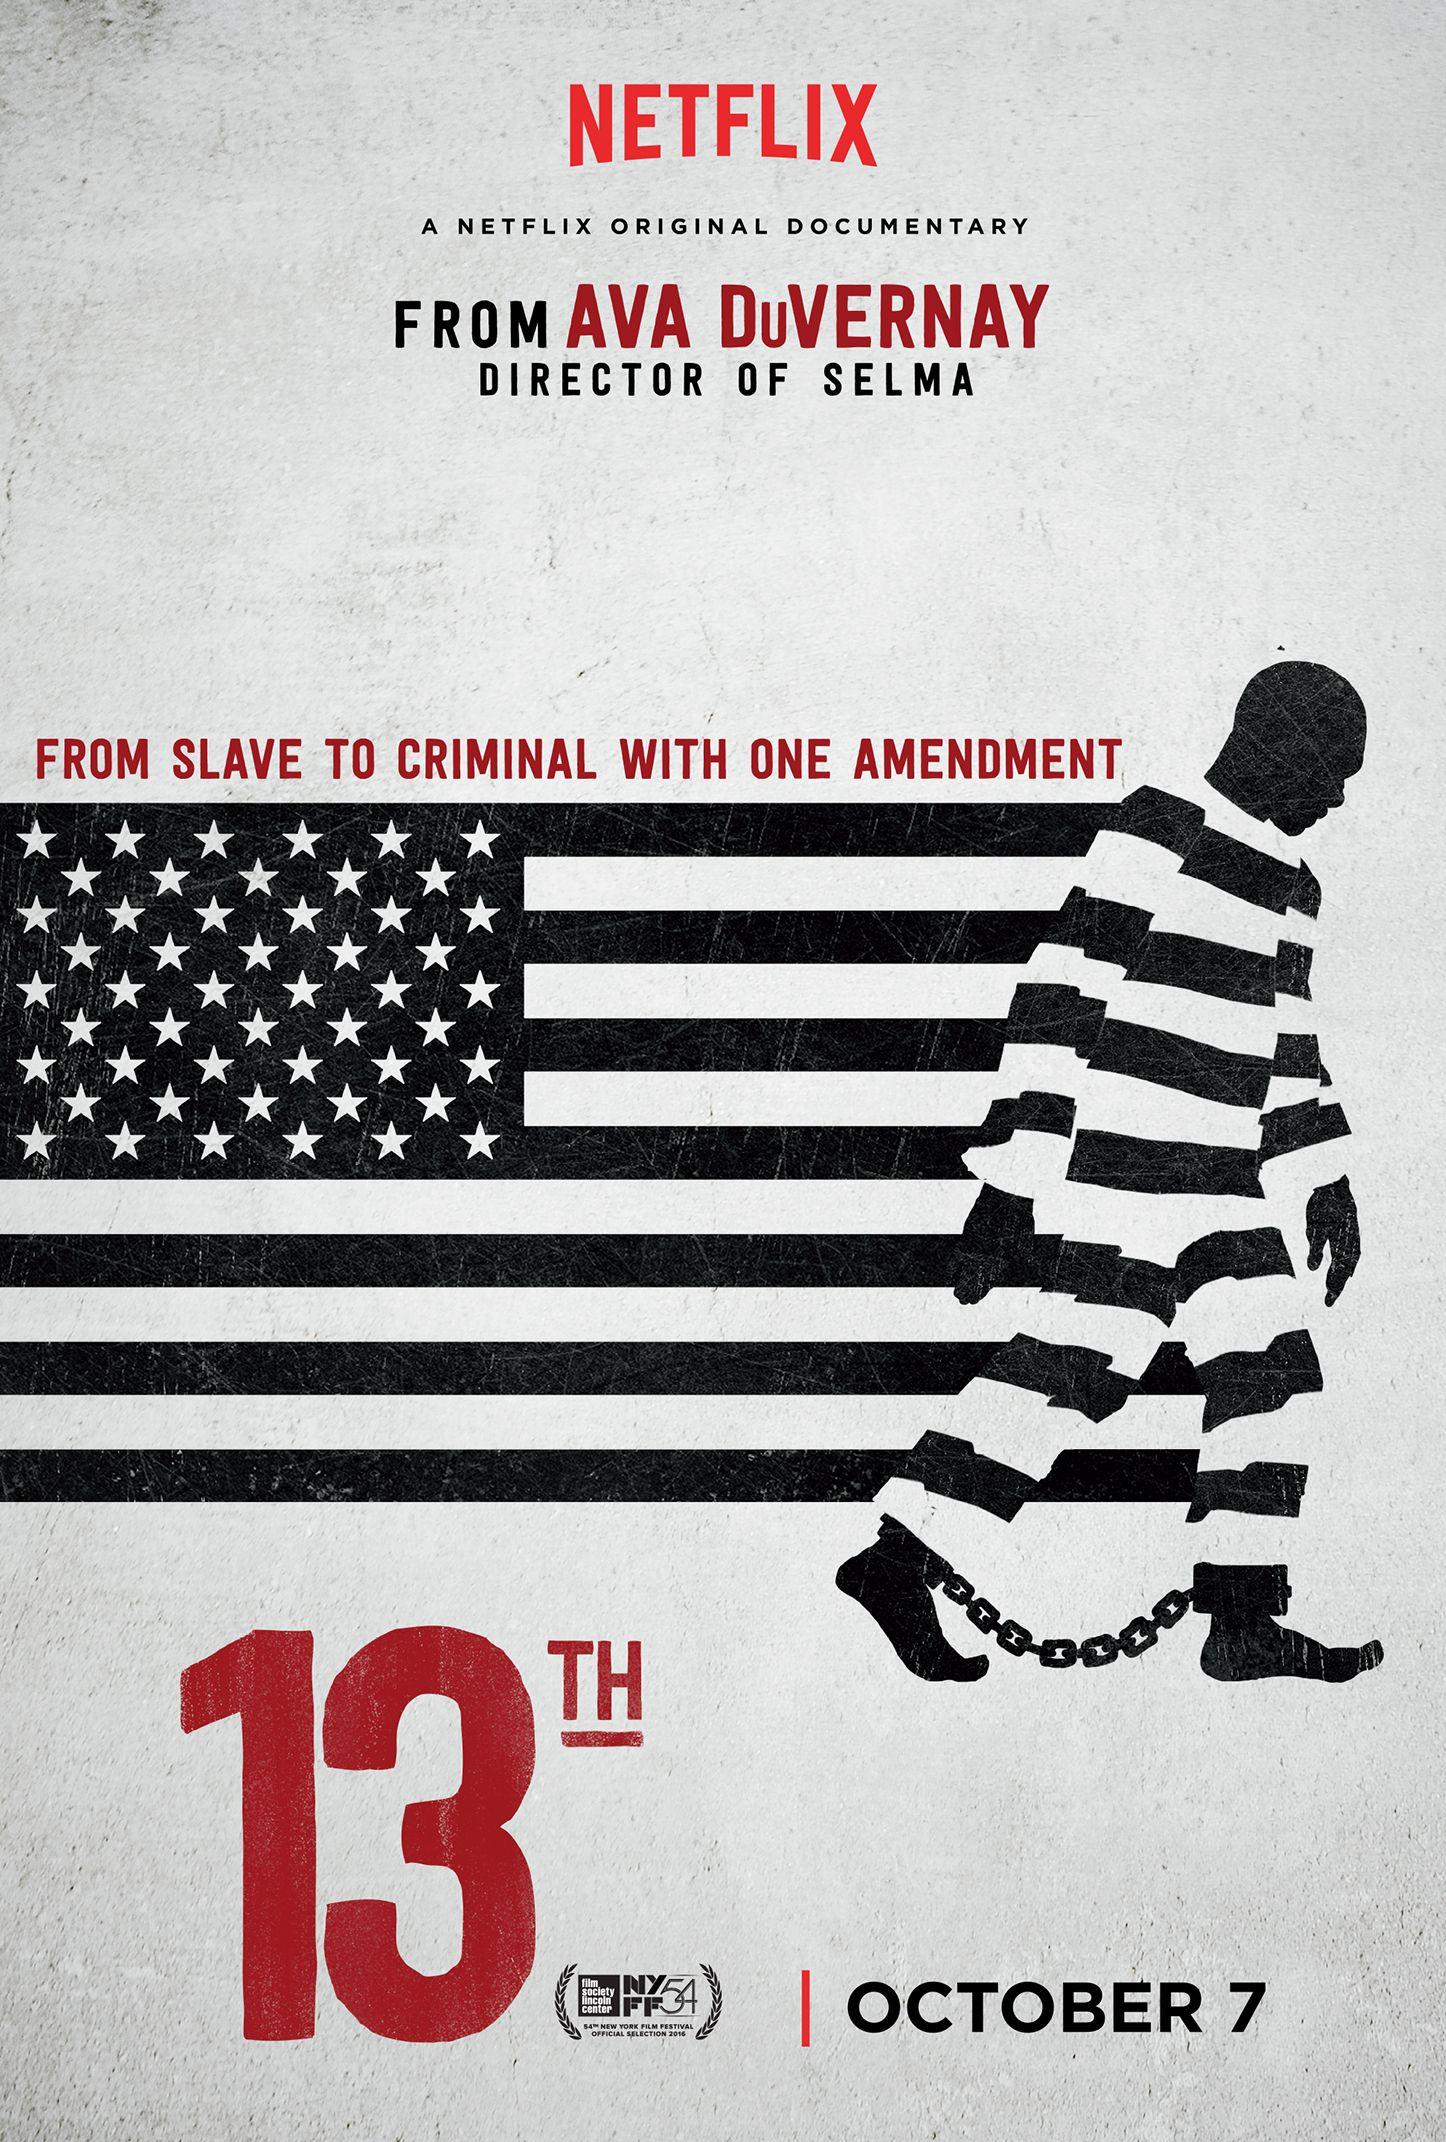 Netflix documentary 13th